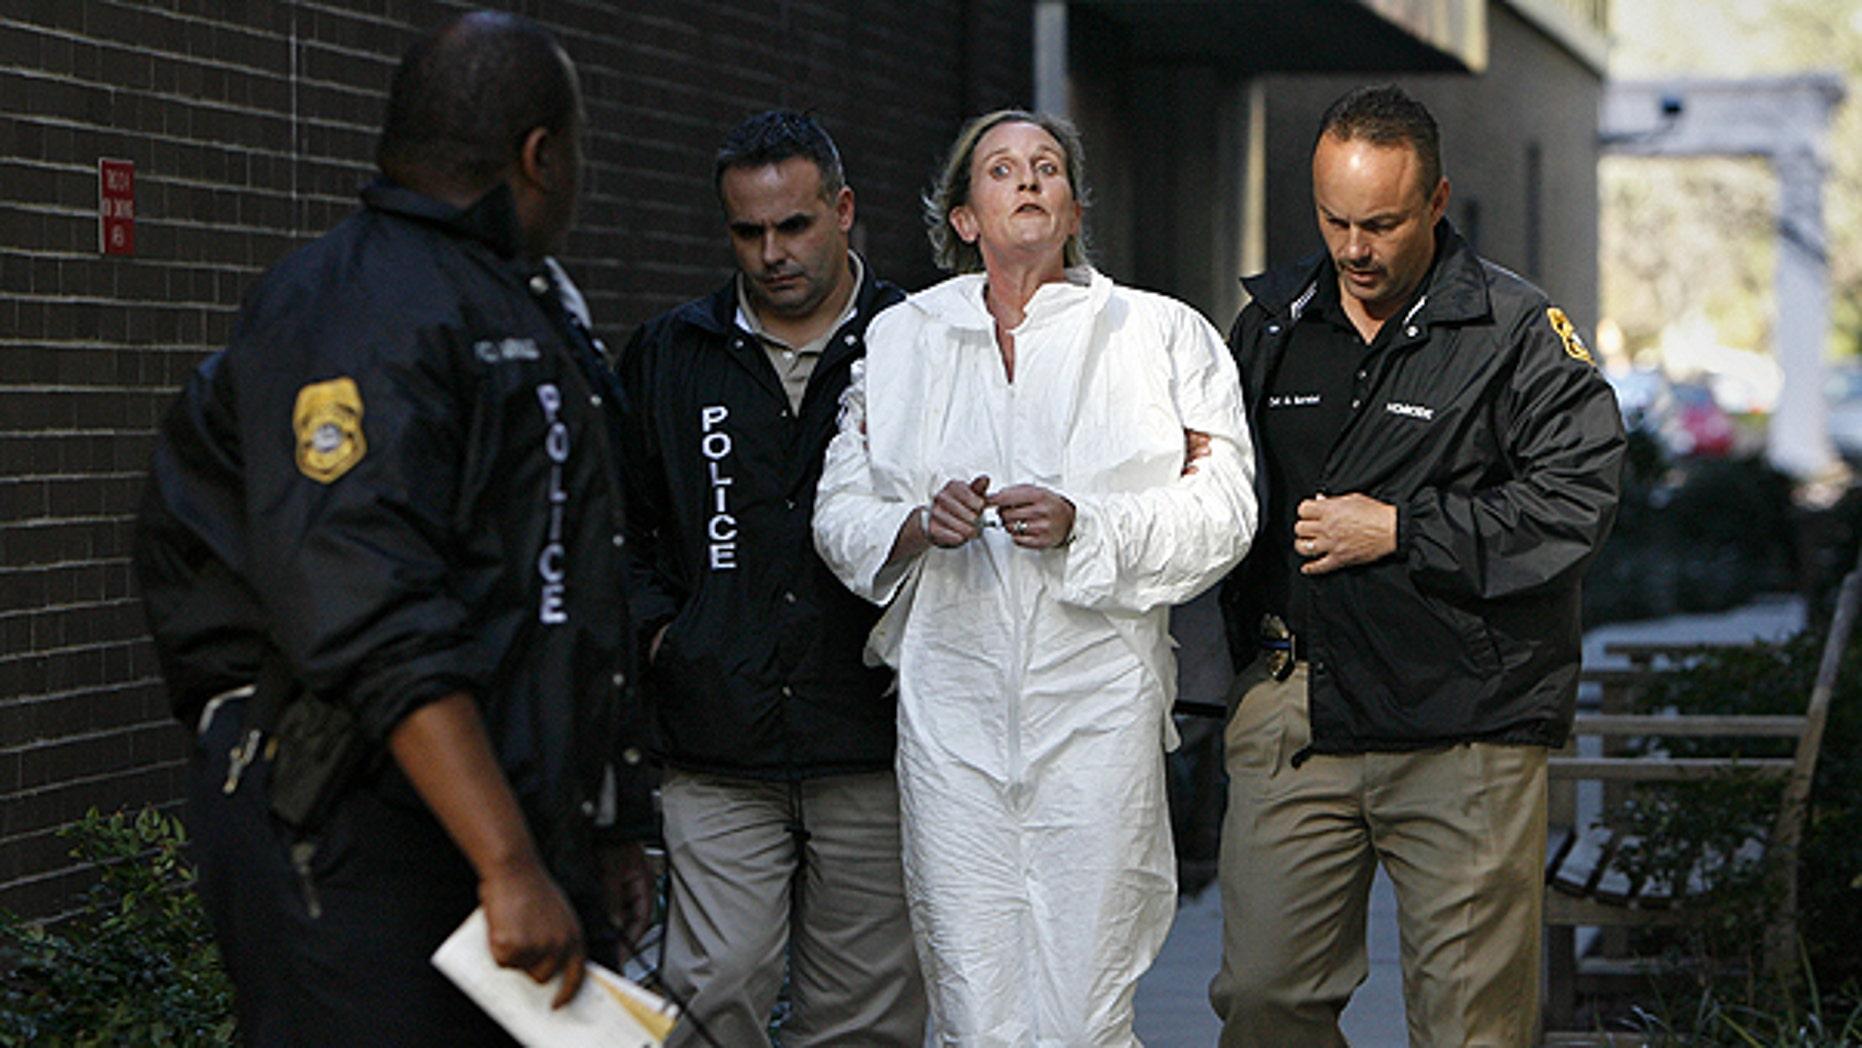 Jan. 28: Tampa Police officer escorts Julie Powers Schenecker to Orient Road Jail in Tampa, Fla.